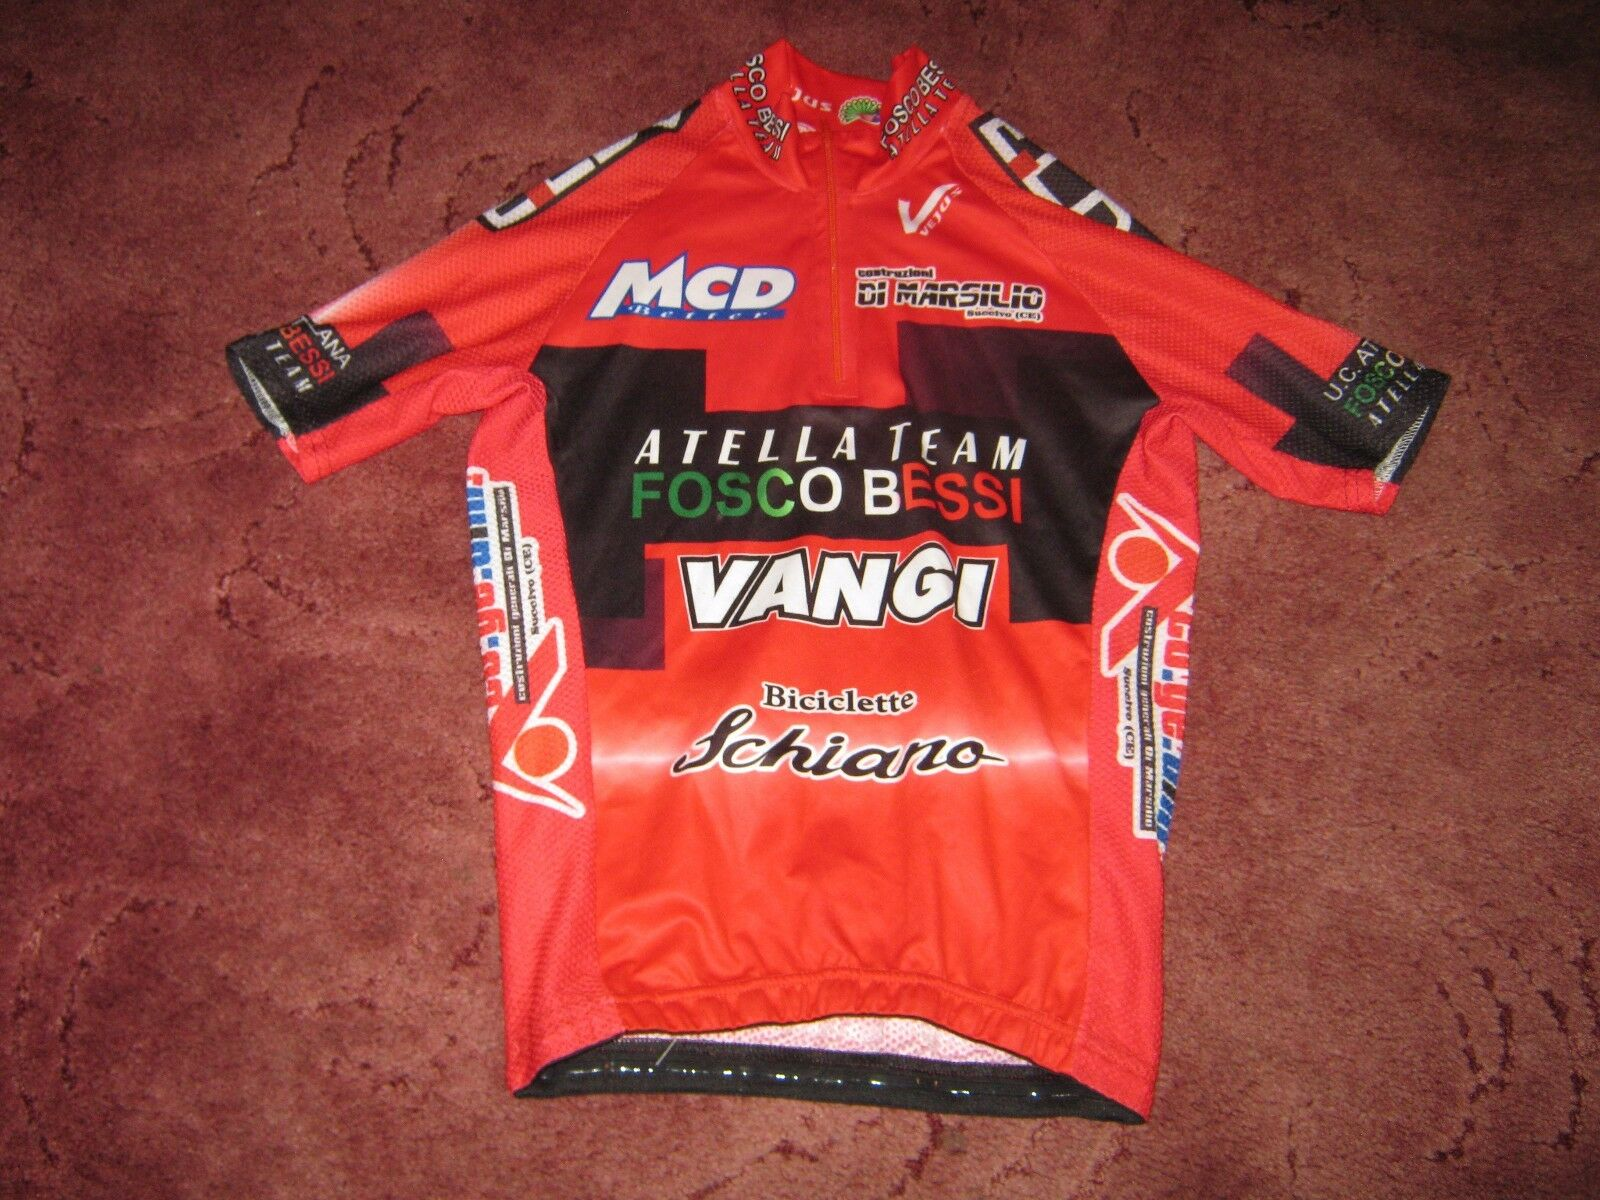 ATTELA TEAM FOSCO BESSIVEJUS ITALIAN CYCLING JERSEY [2]